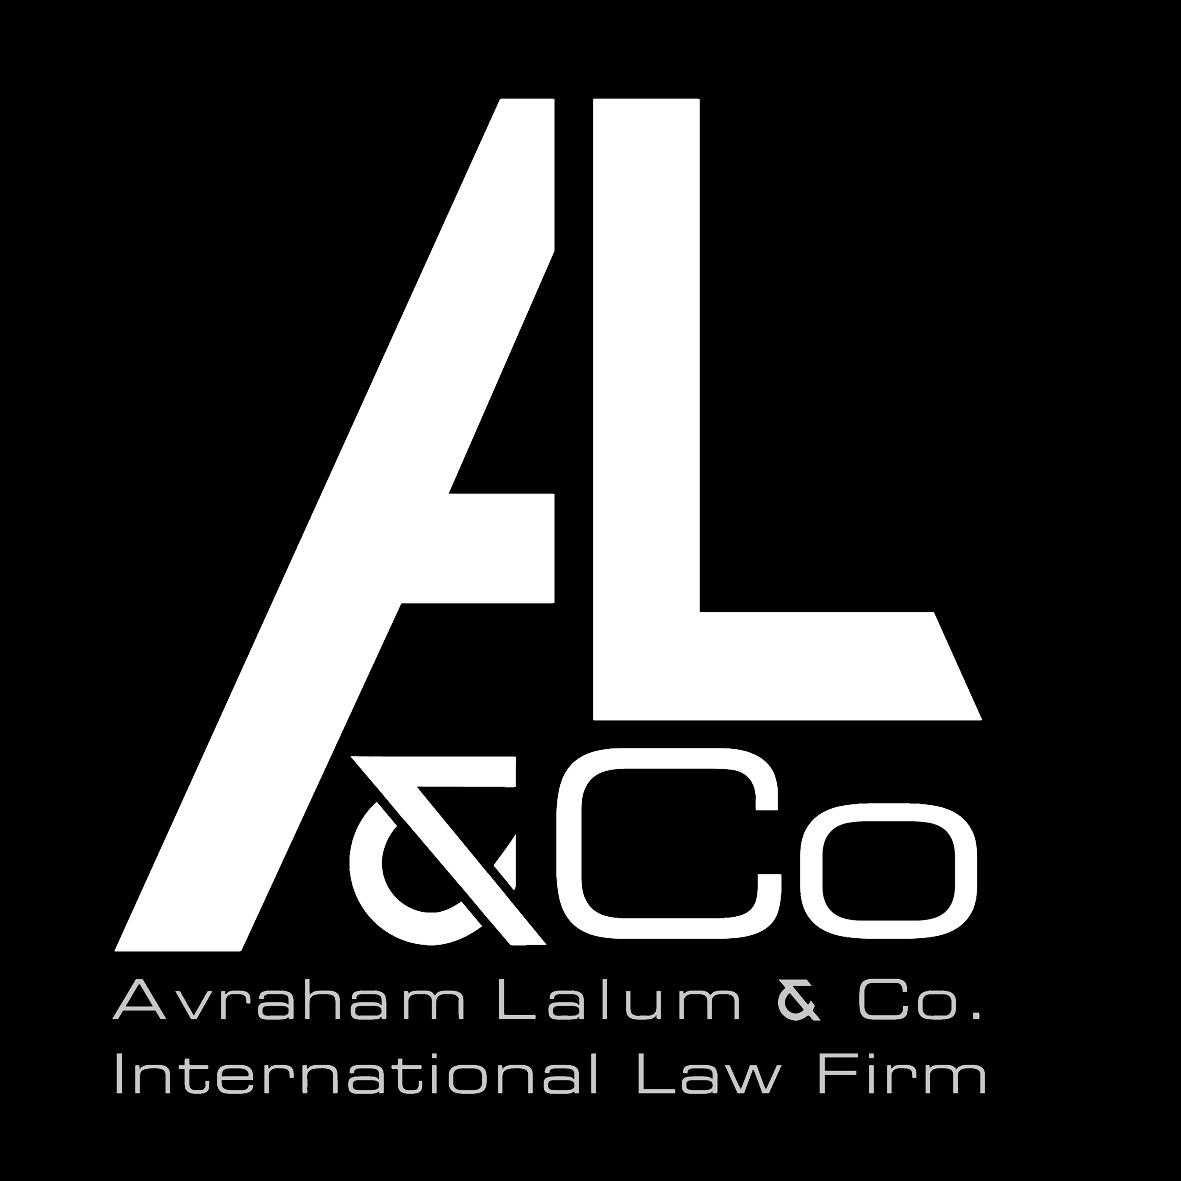 AL- אברהם ללום ושות', משרד עורכי דין